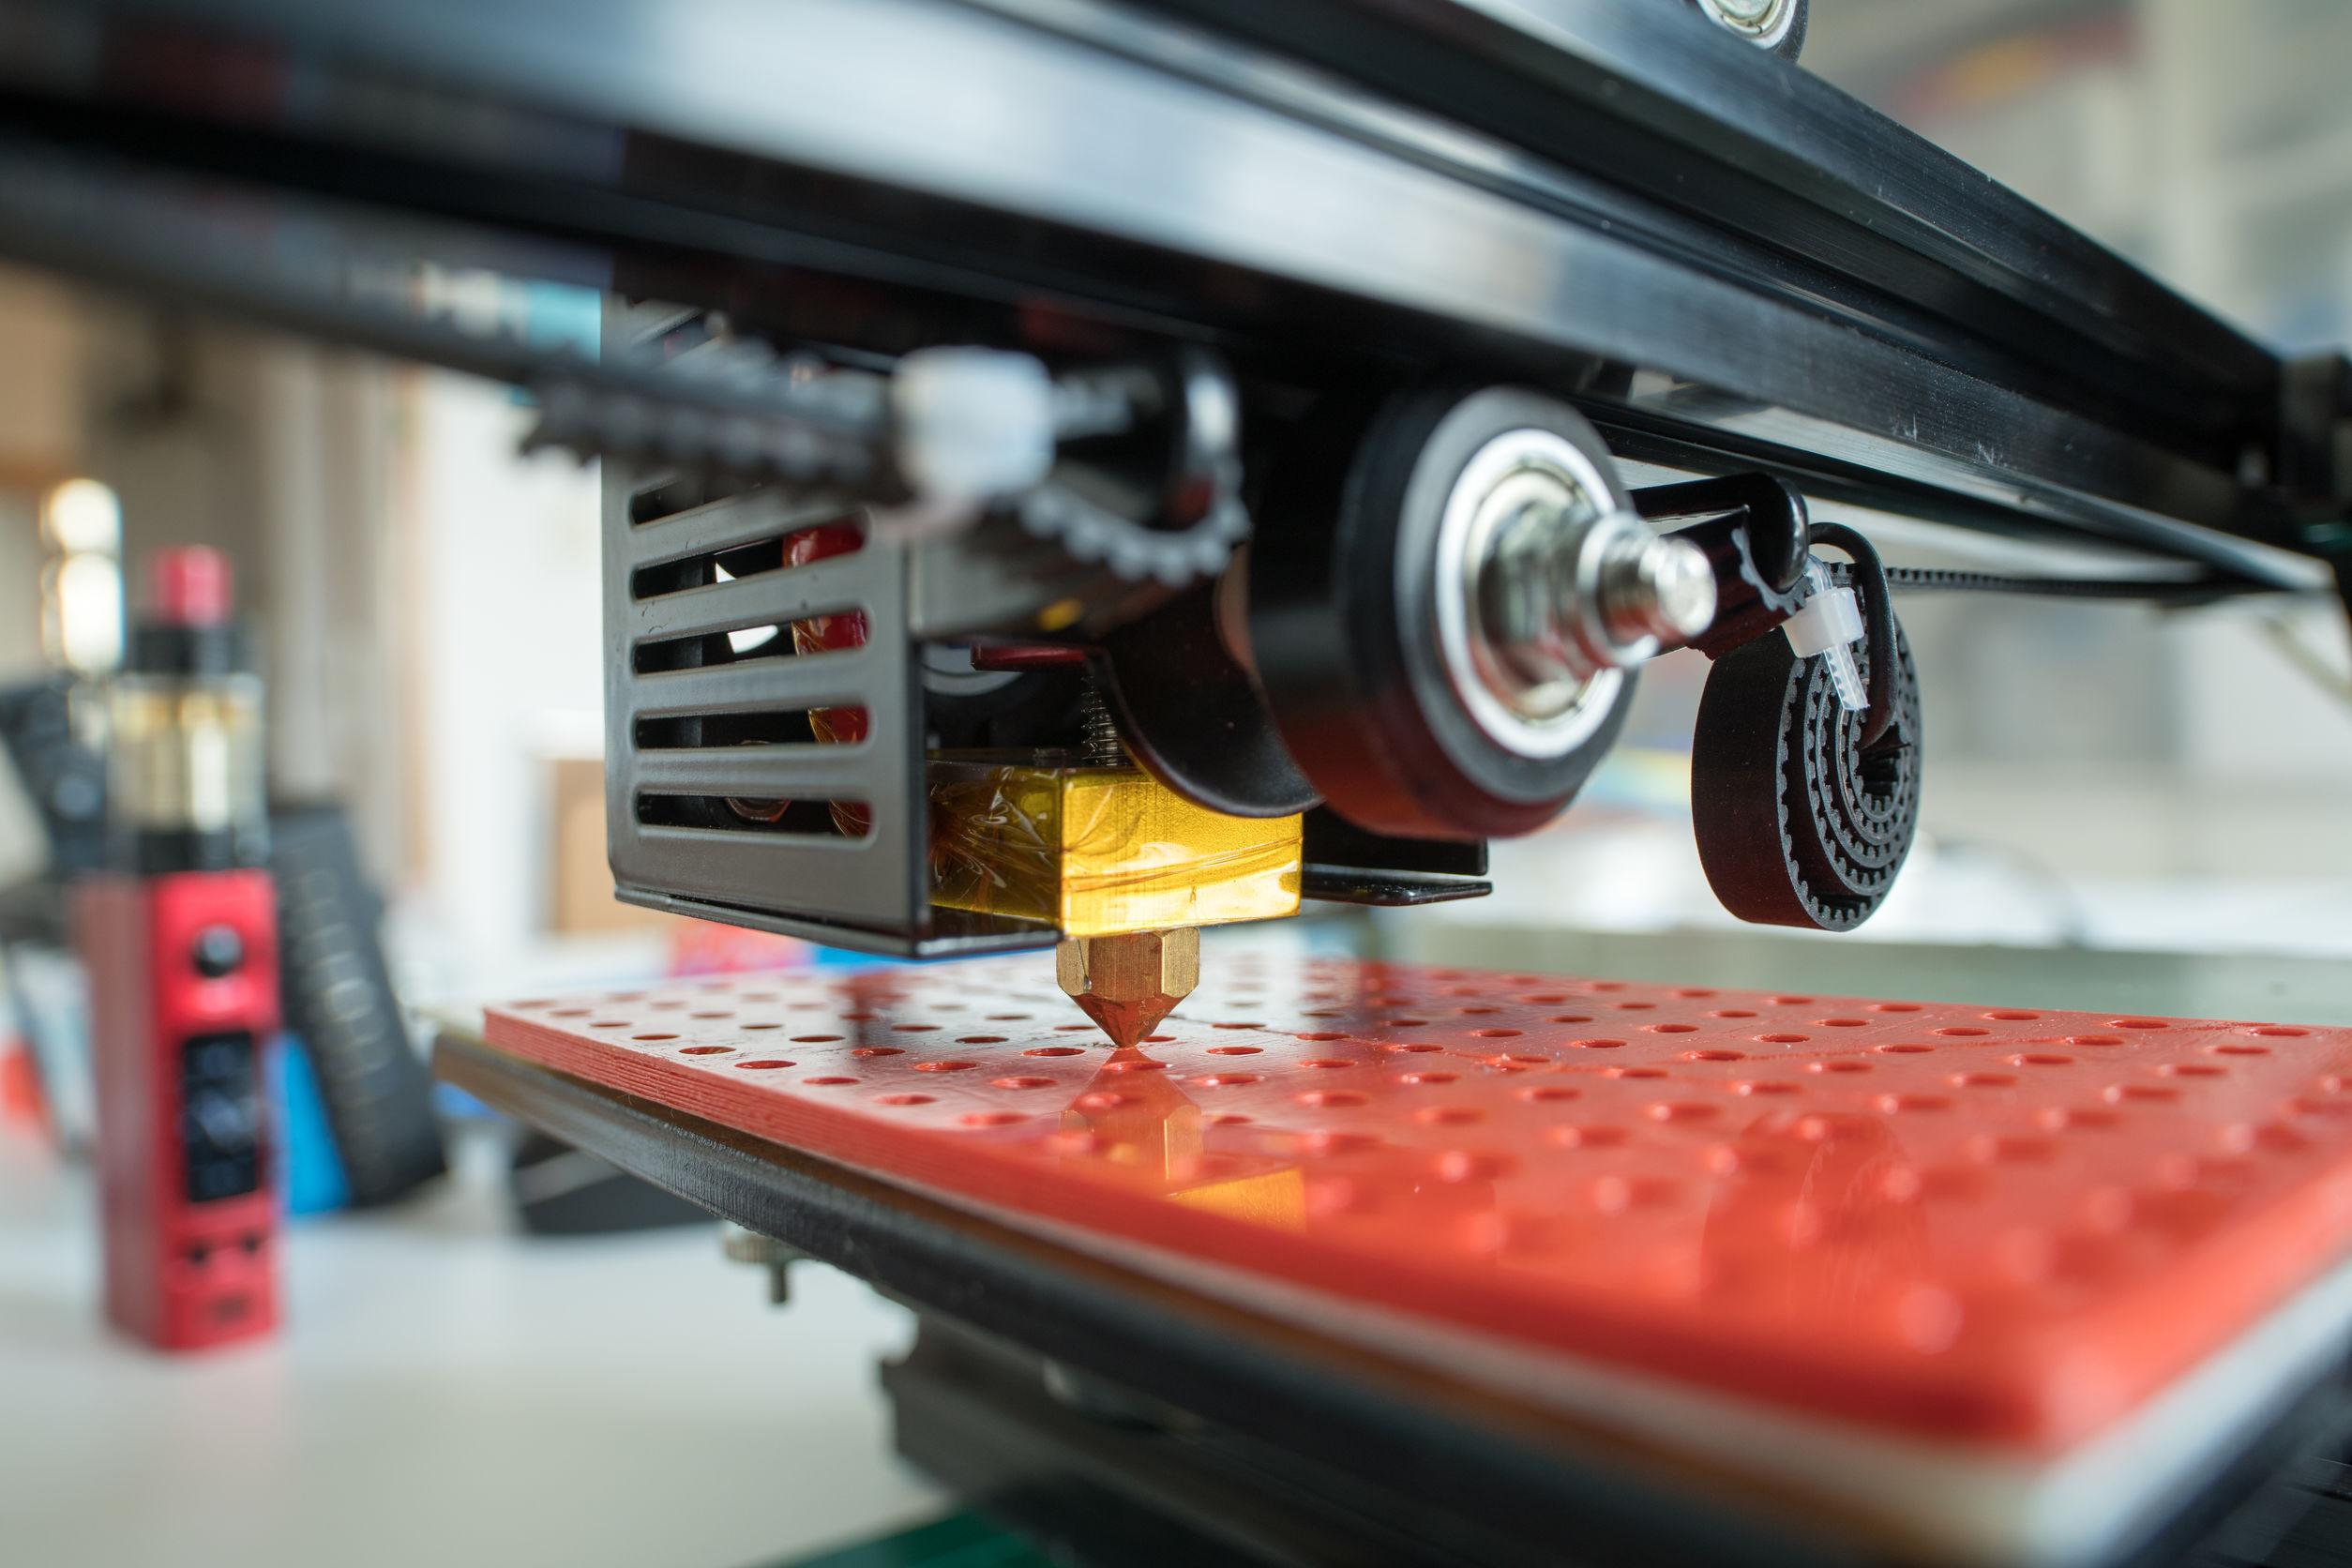 Impresora 3D: ¿Cuál es la mejor del 2021?